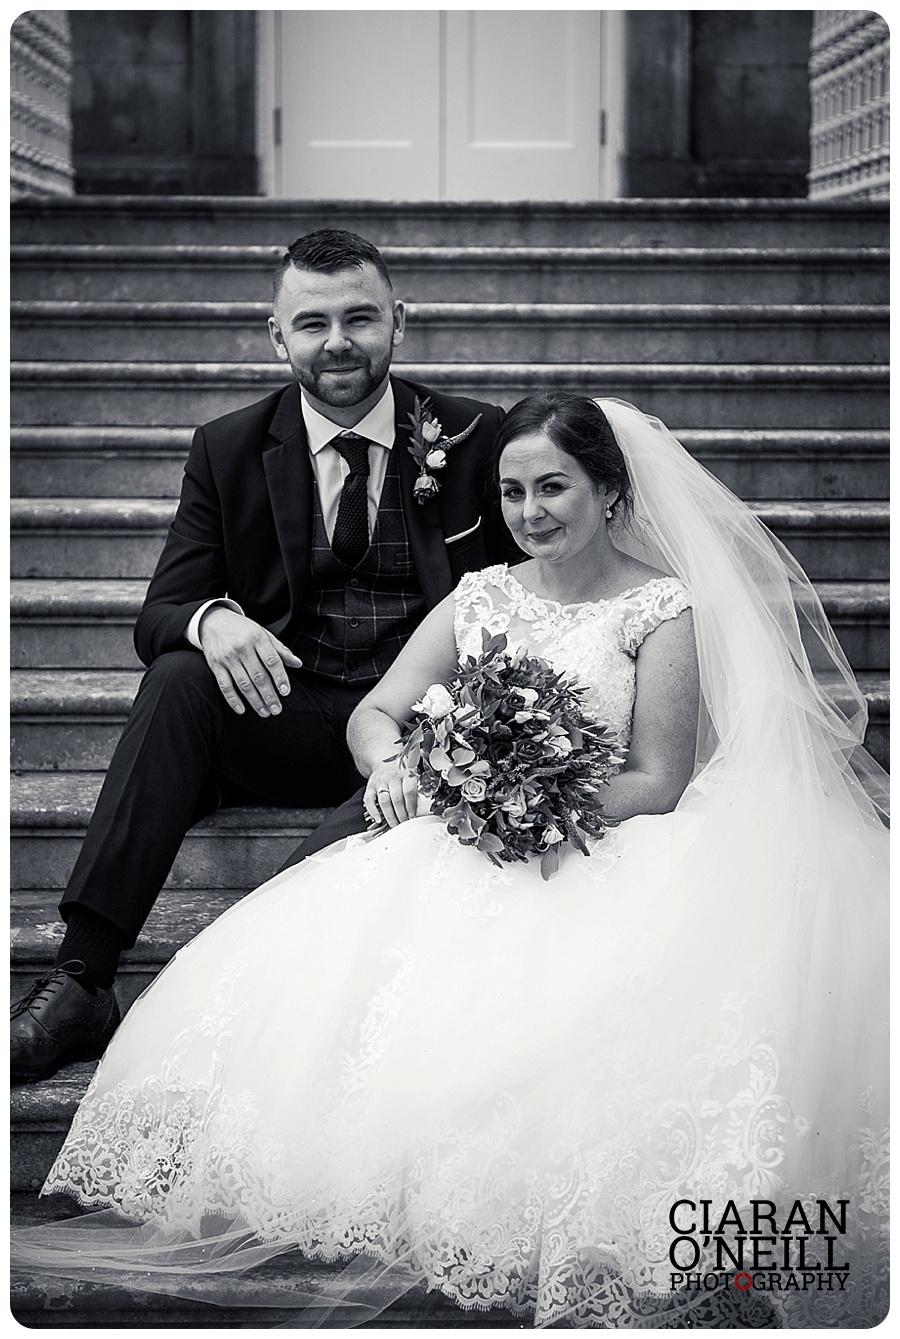 Danielle & Ryan's wedding at the Hillgrove Hotel by Ciaran O'Neill Photography